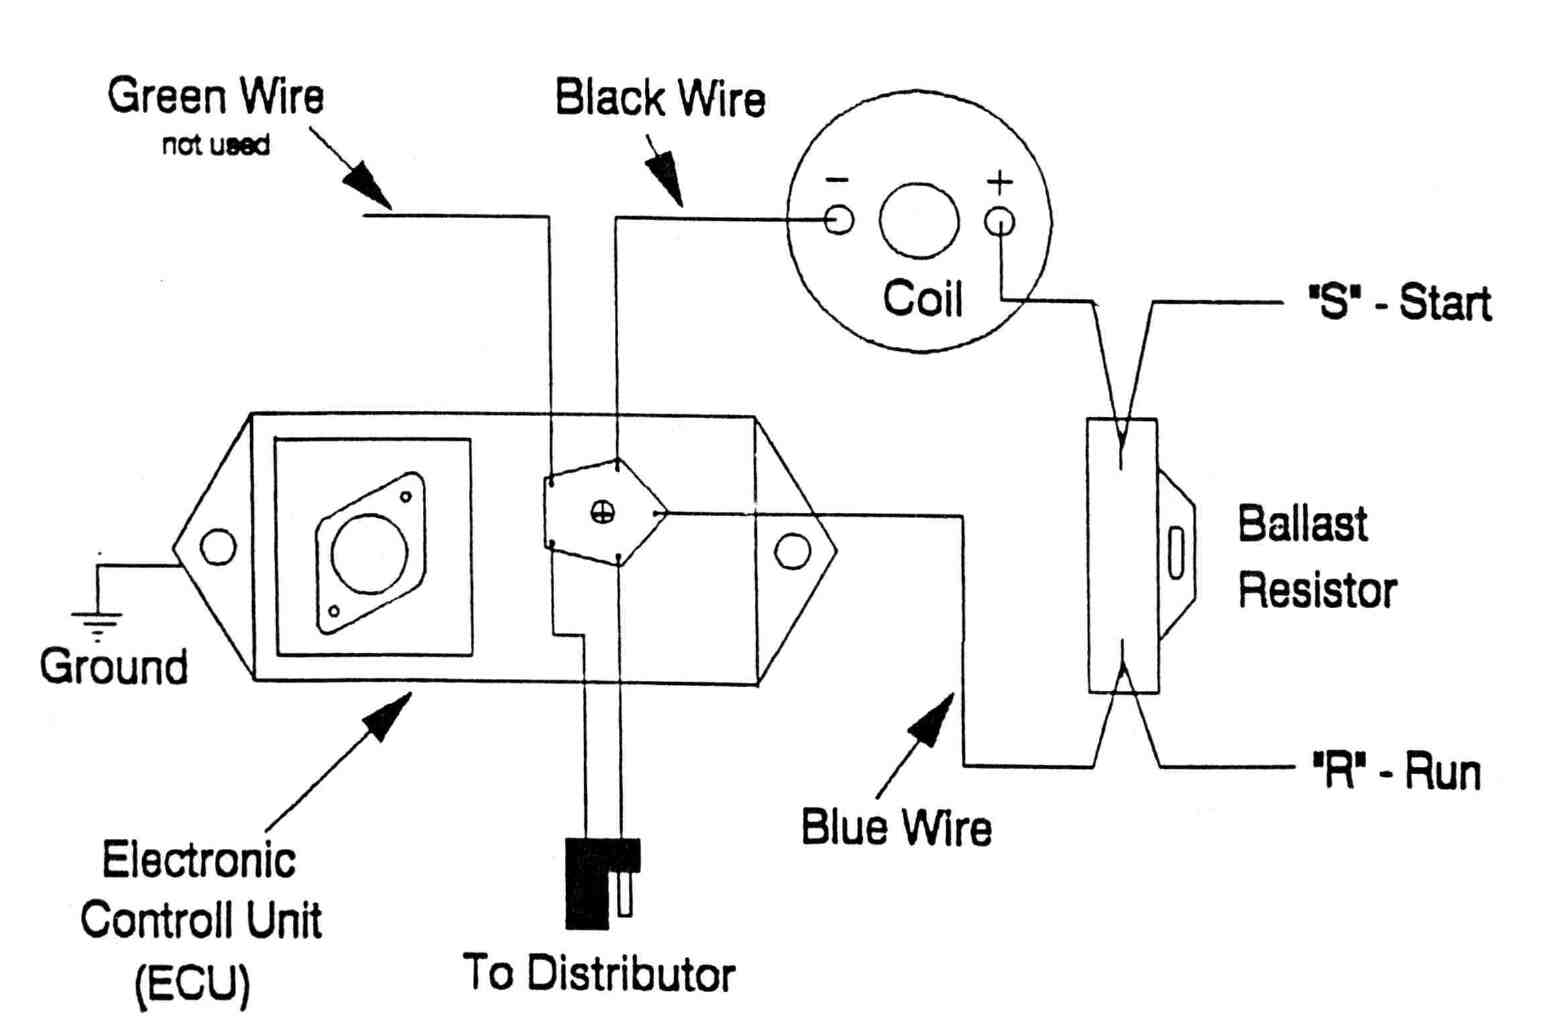 1994 dodge dakota wiring vl 3533  mopar ballast resistor wiring diagram  mopar ballast resistor wiring diagram